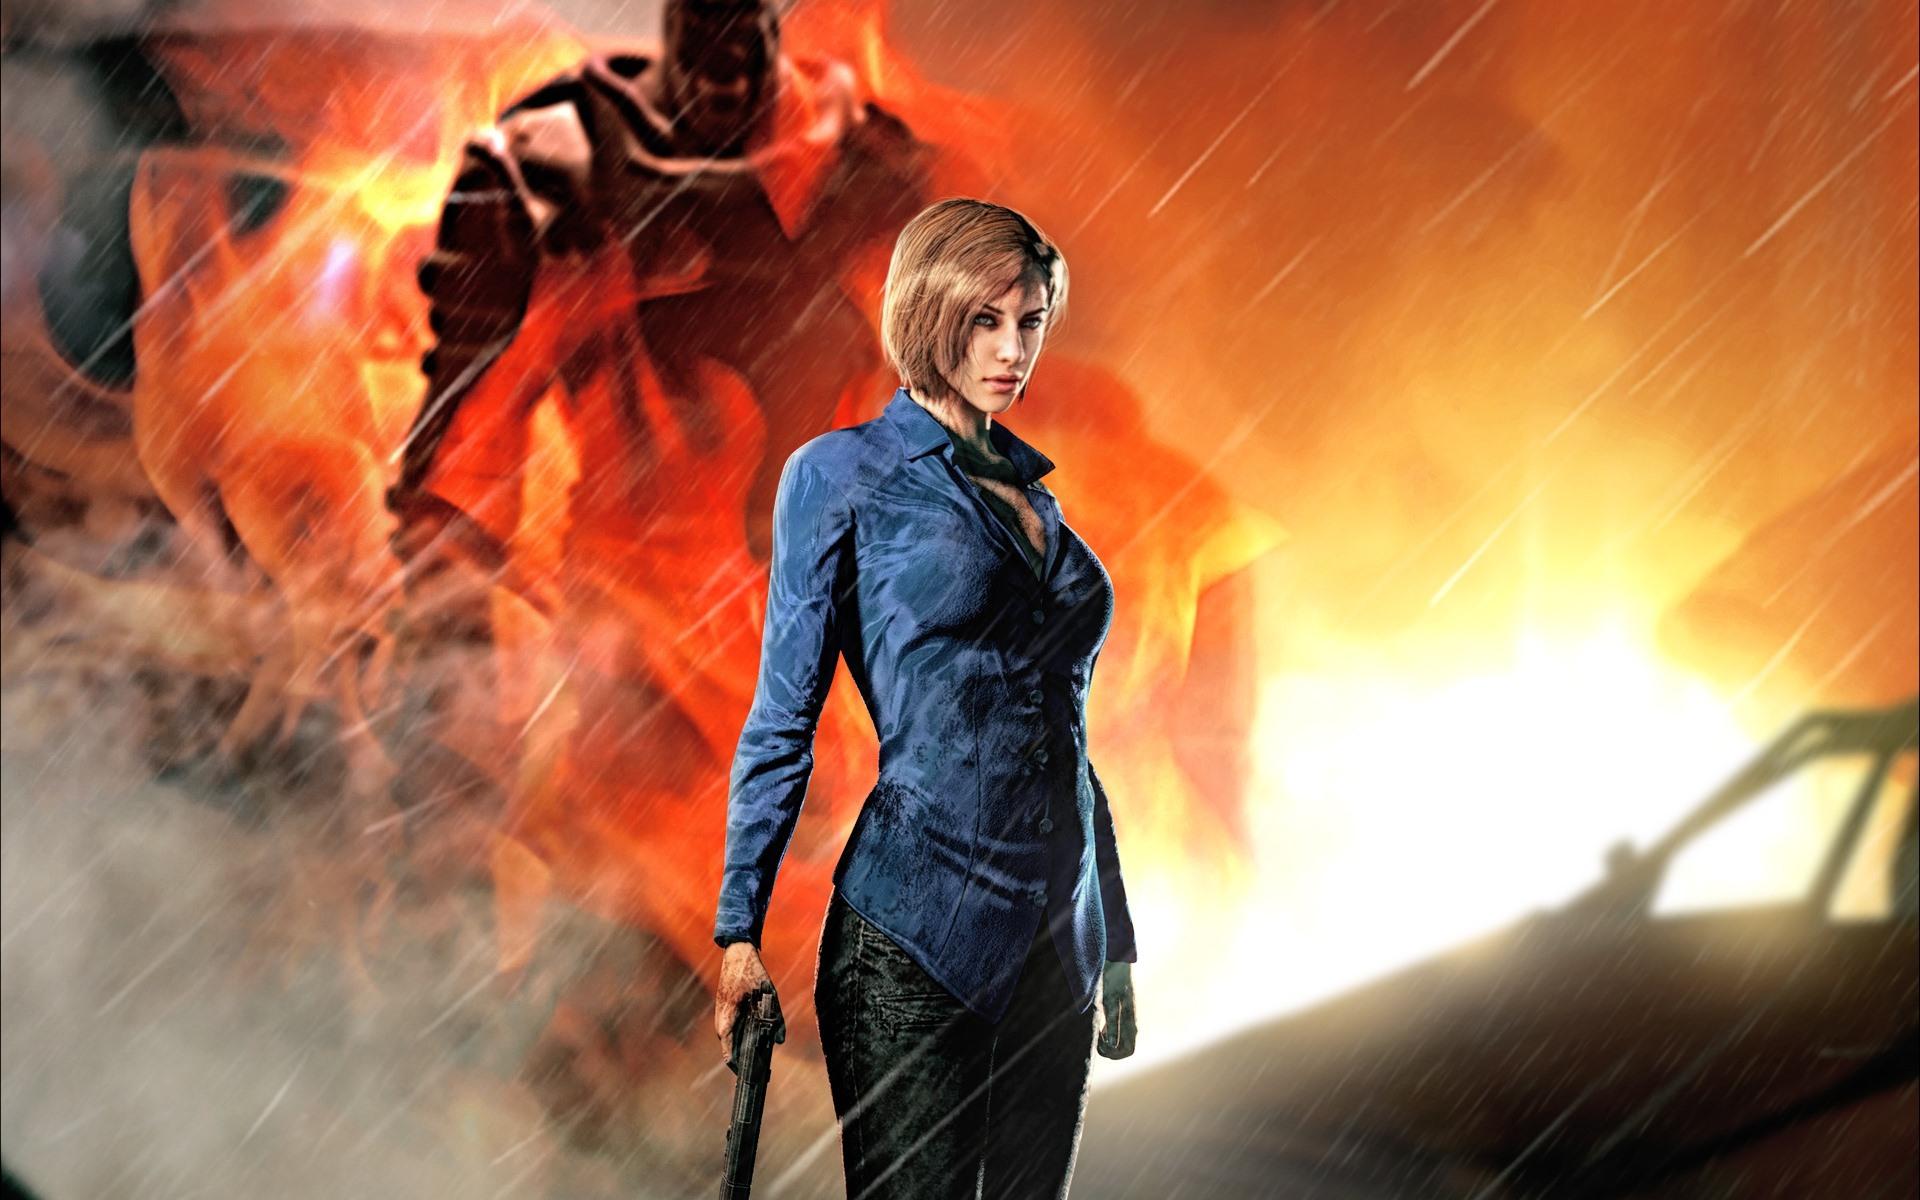 Wallpaper Resident Evil 3 Nemesis Girl Gun Rain 1920x1200 Hd